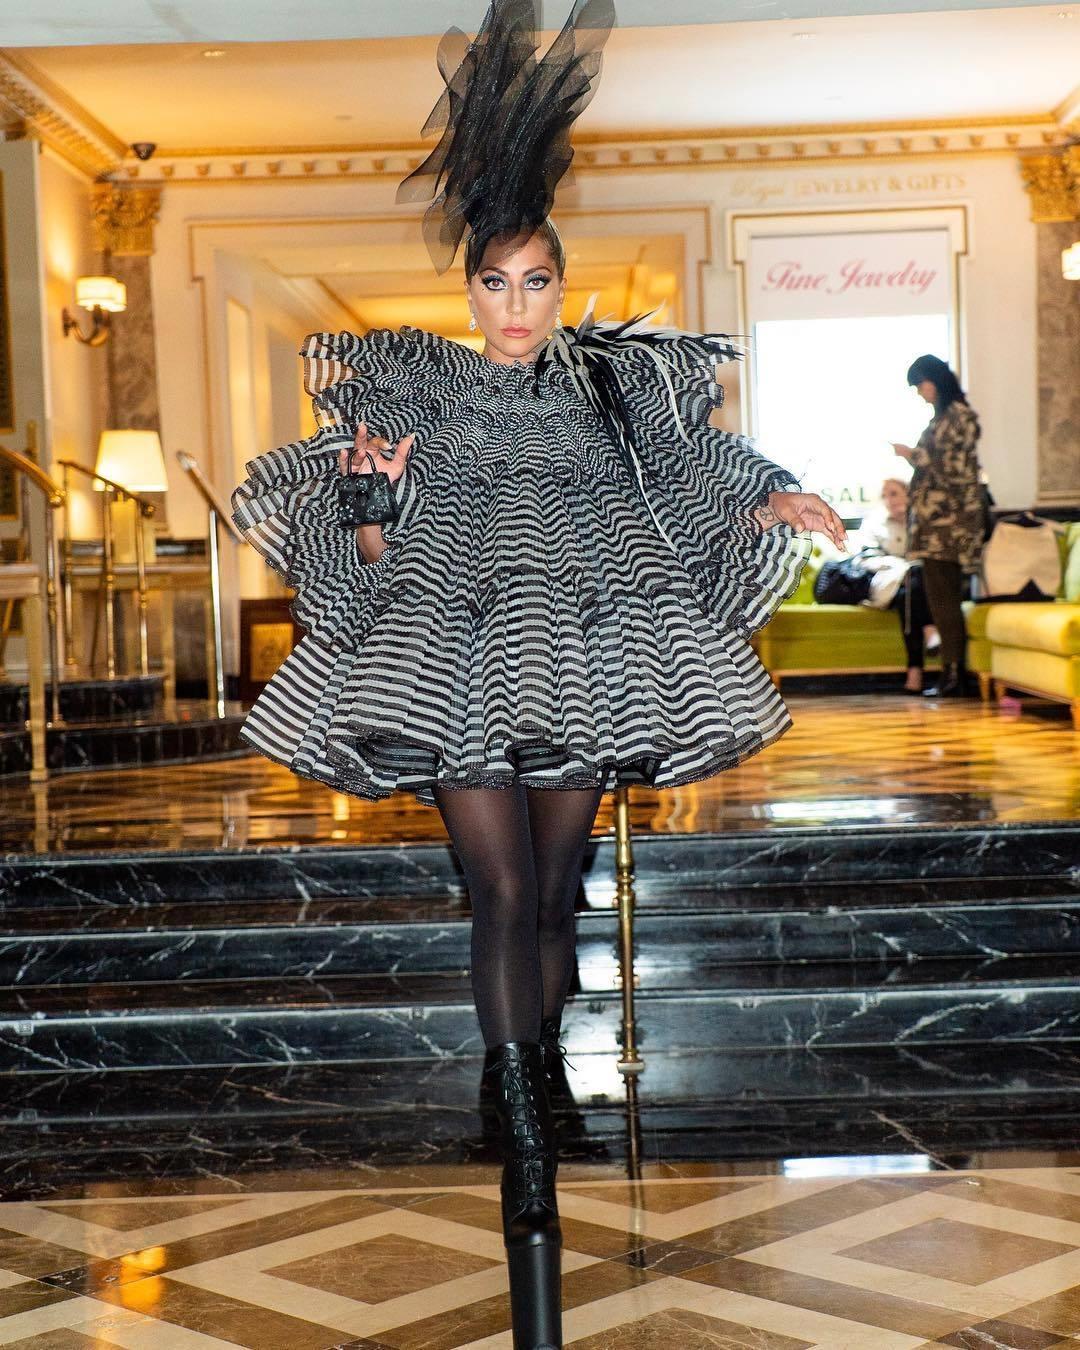 Gaga穿条纹裙踩恨天高出席活动,大长腿美过超模,个性穿搭就服她